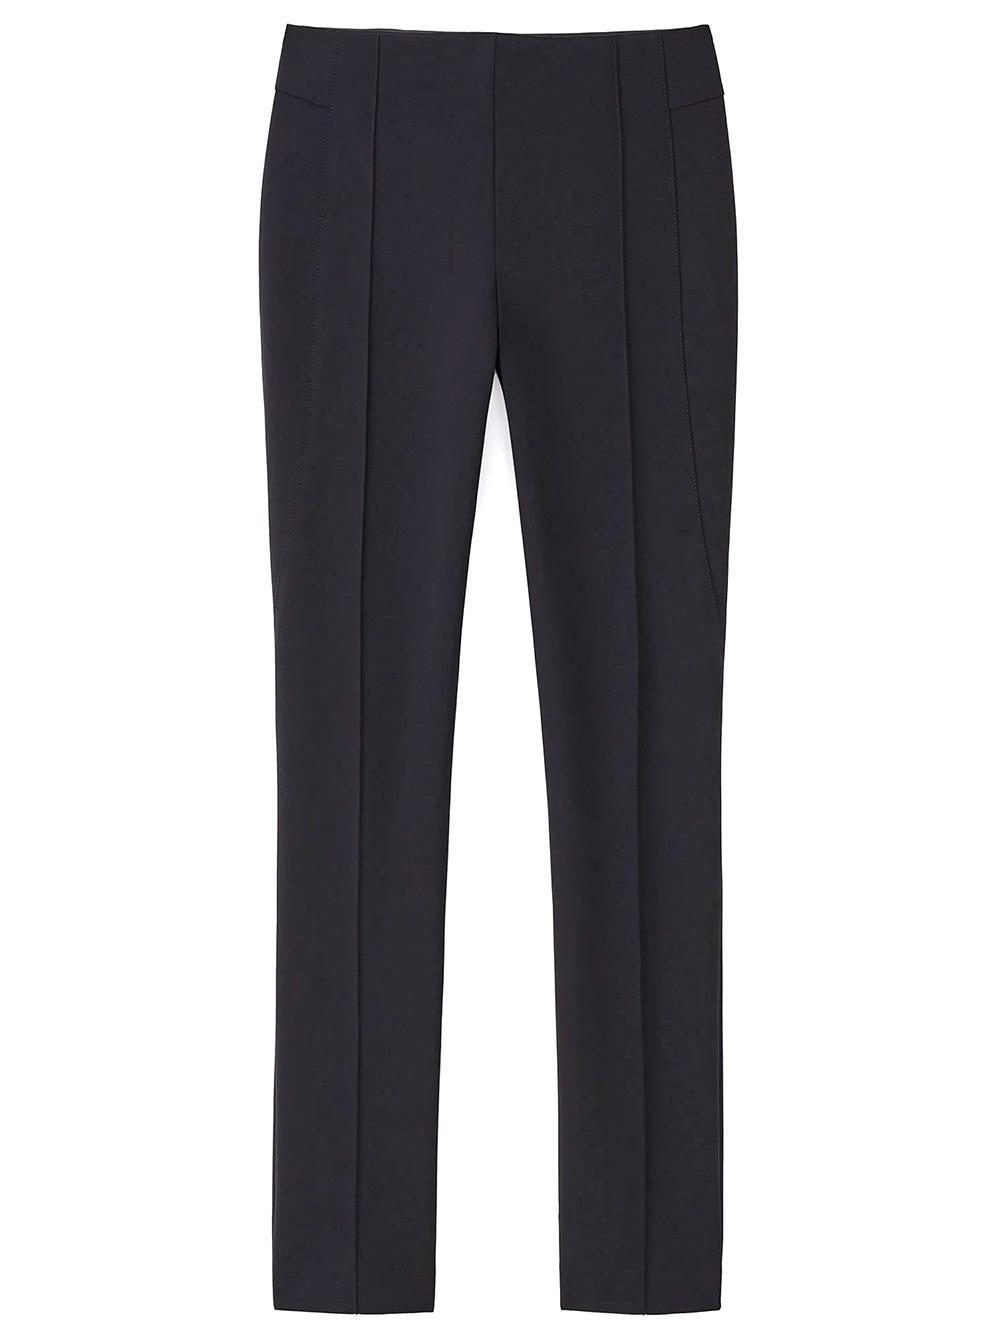 Gramercy Pant Skinny Str Item # MP949R-J525